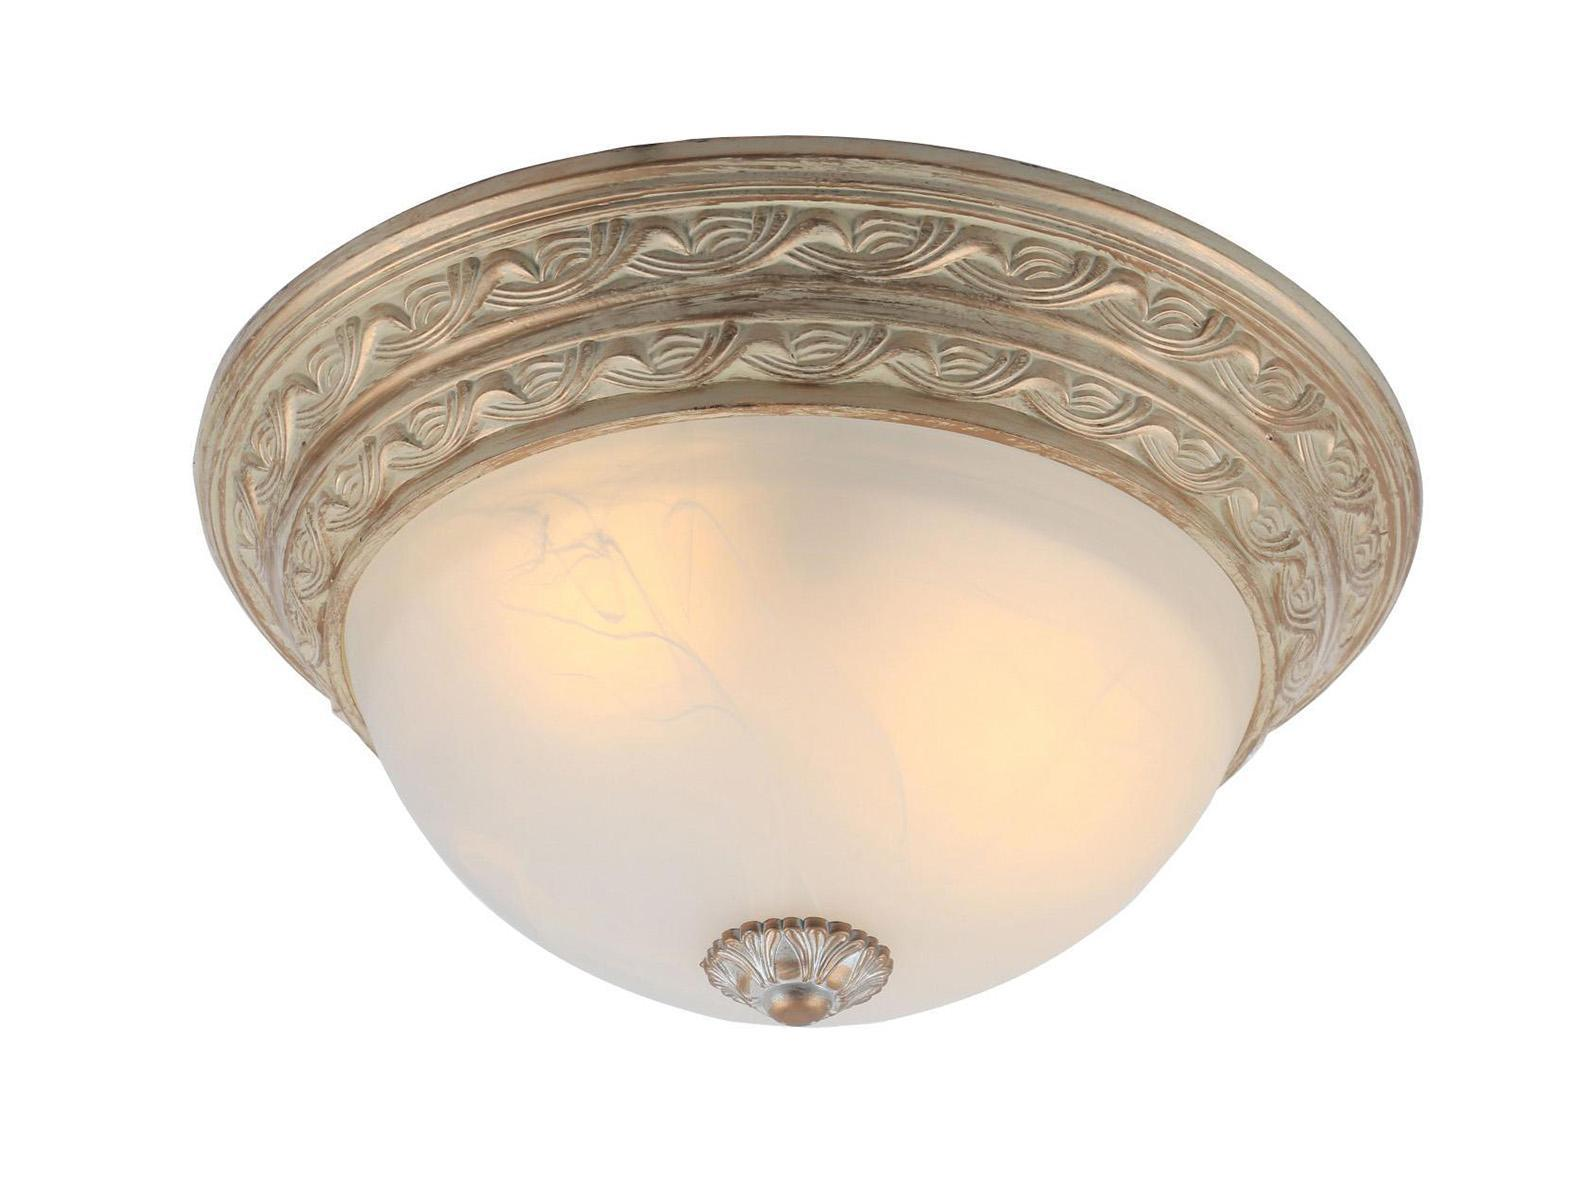 A8013PL-2WA PIATTI Потолочный светильник